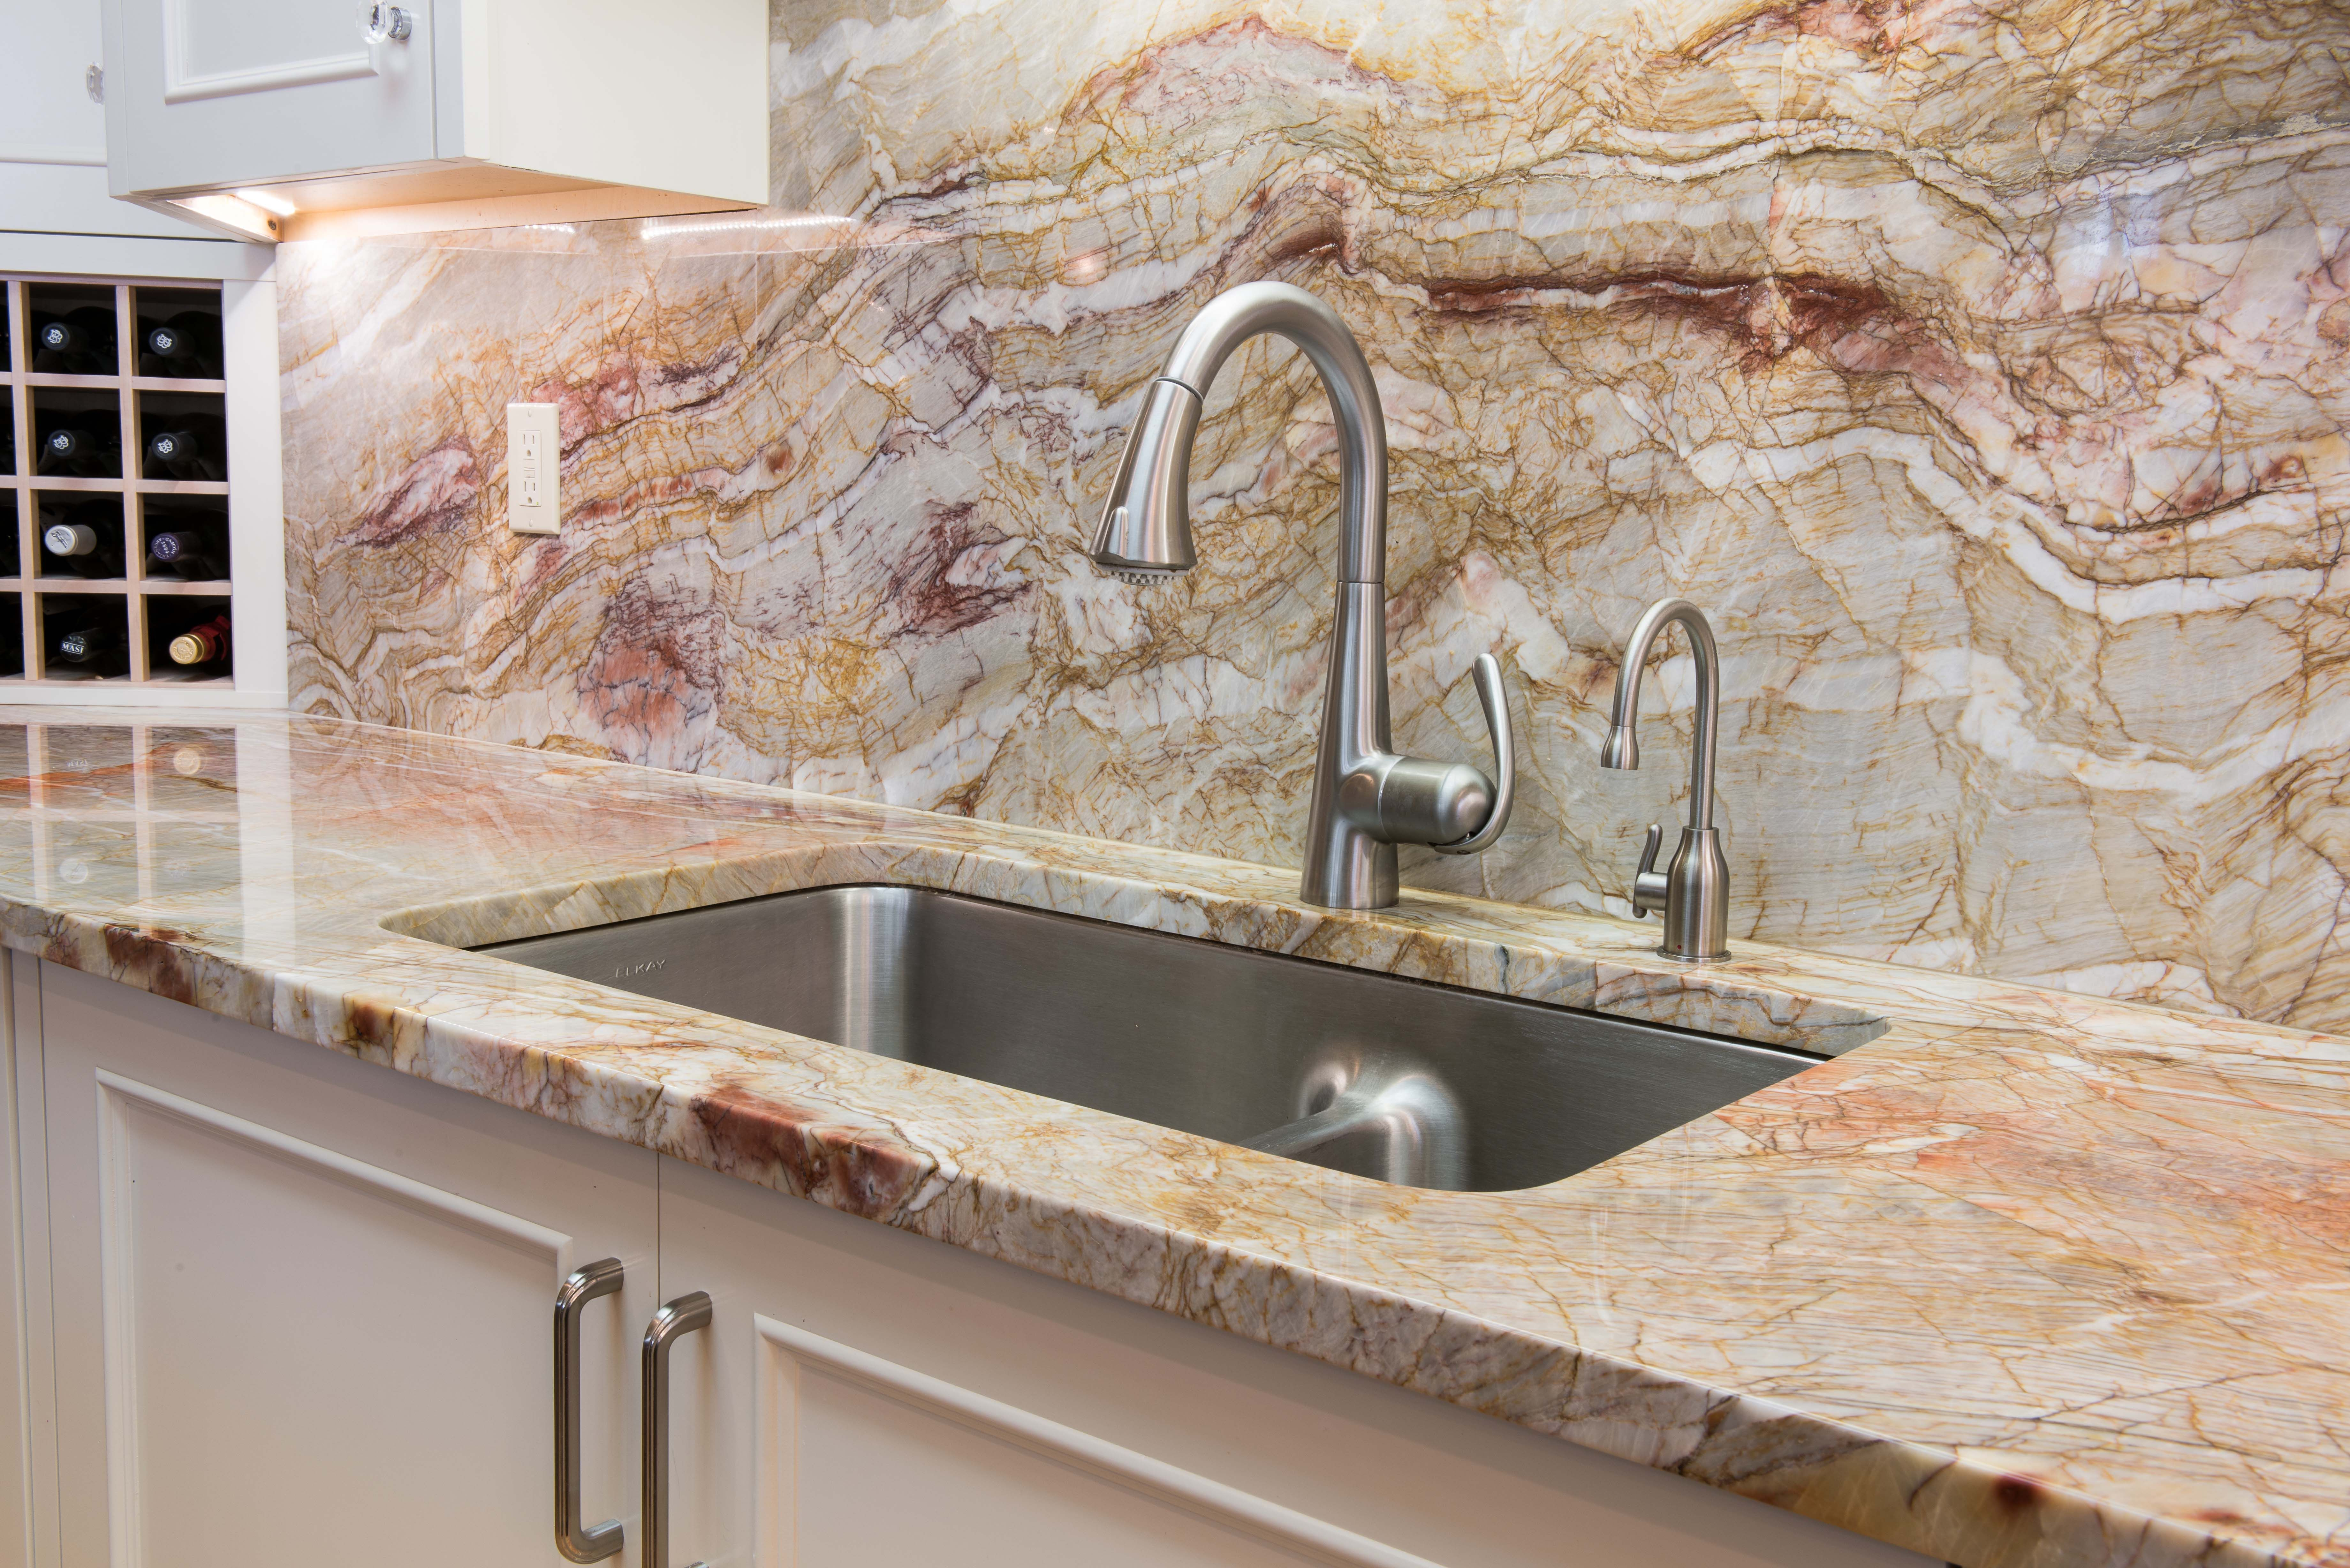 Traditional Kitchen Onyx Slab Countertop And Backsplash Stainless Steel Sink Montana Tile Ston Stainless Backsplash Kitchen Must Haves Traditional Kitchen